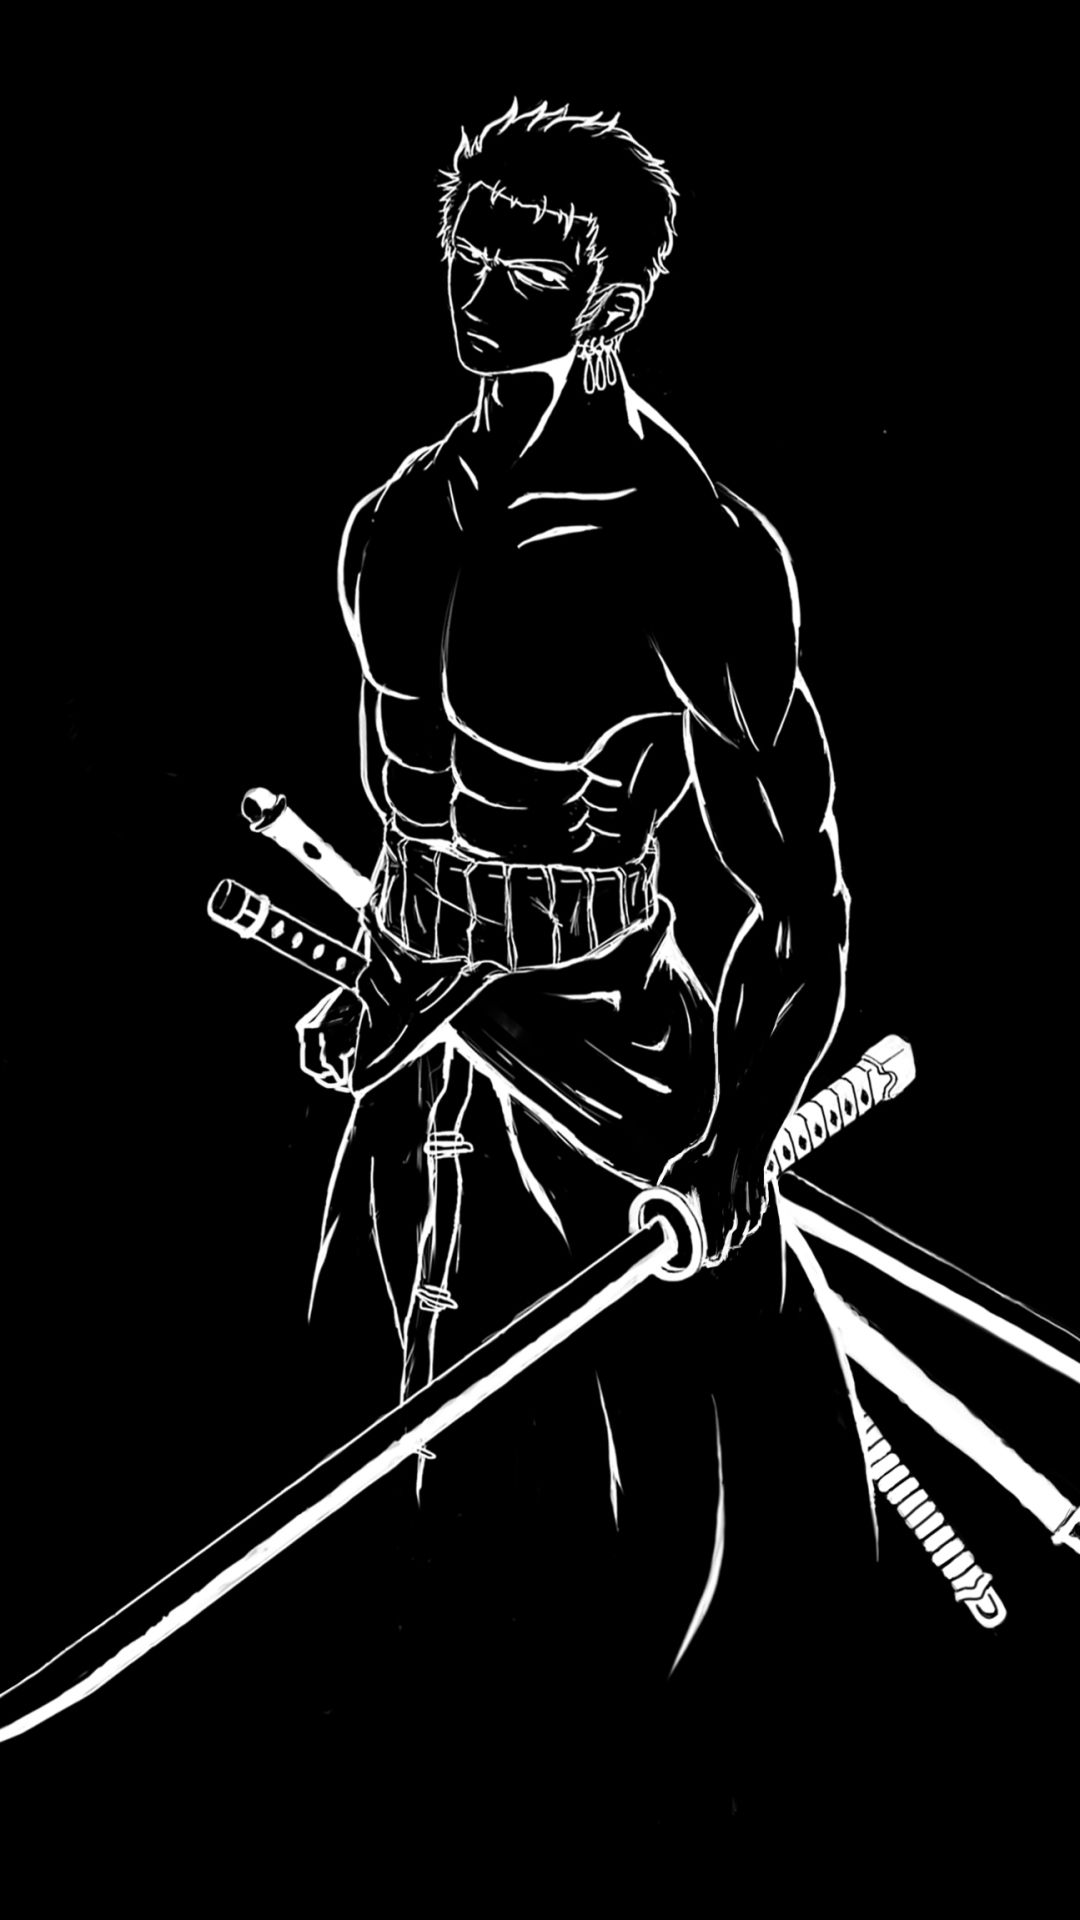 100 Black Wallpaper In 2021 Zoro One Piece One Piece Wallpaper Iphone Zoro Iphone one piece black and white